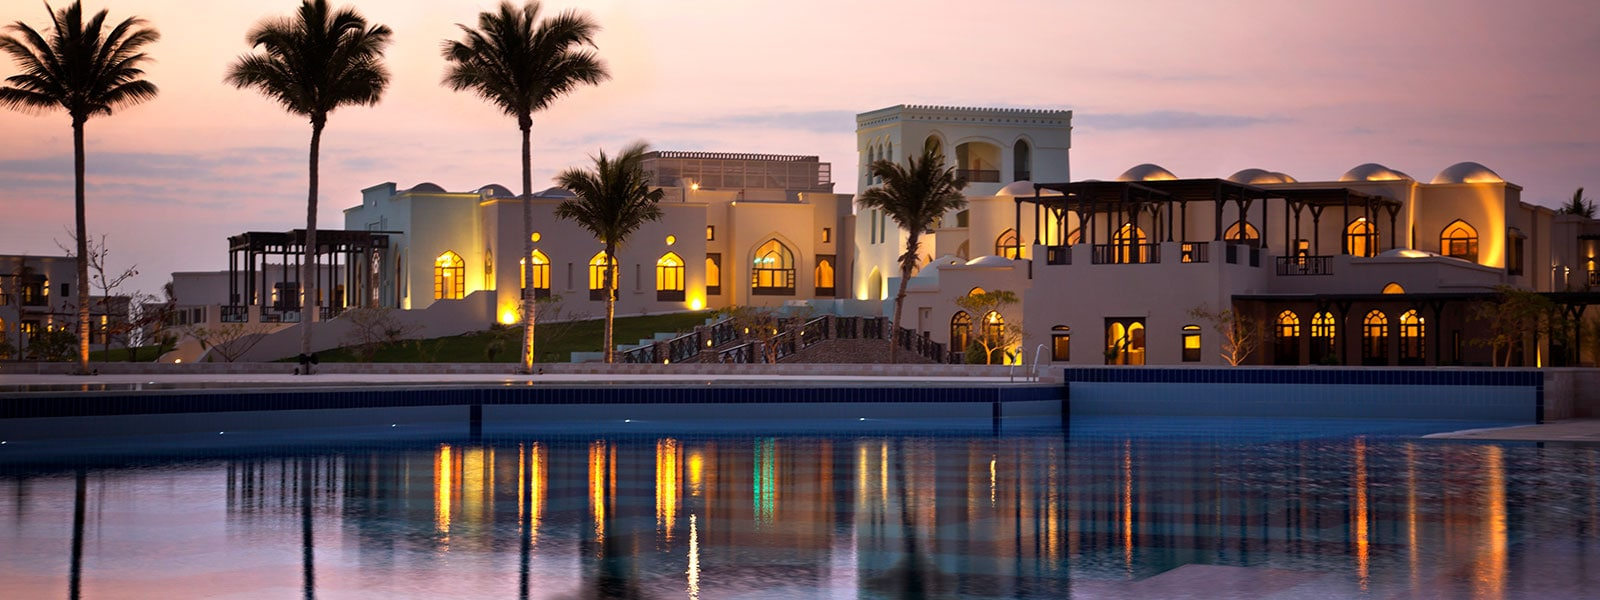 Salalah Rotana Resort Salalah Dhofar Poolside View